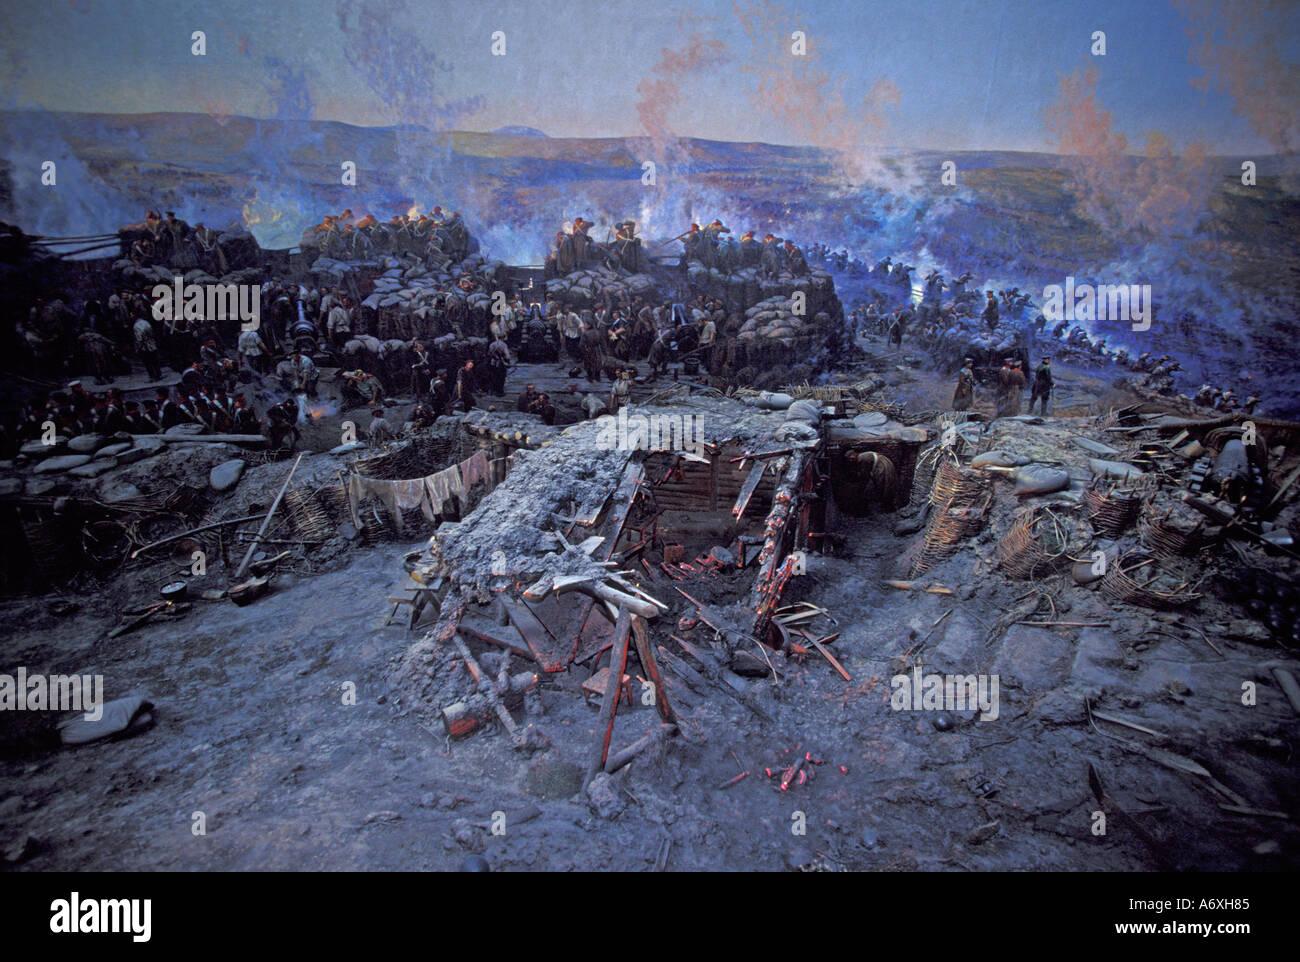 EU, Ukraine, Sevastopol, Panorama museum, huge painting of 1855 Crimean War seige - Stock Image